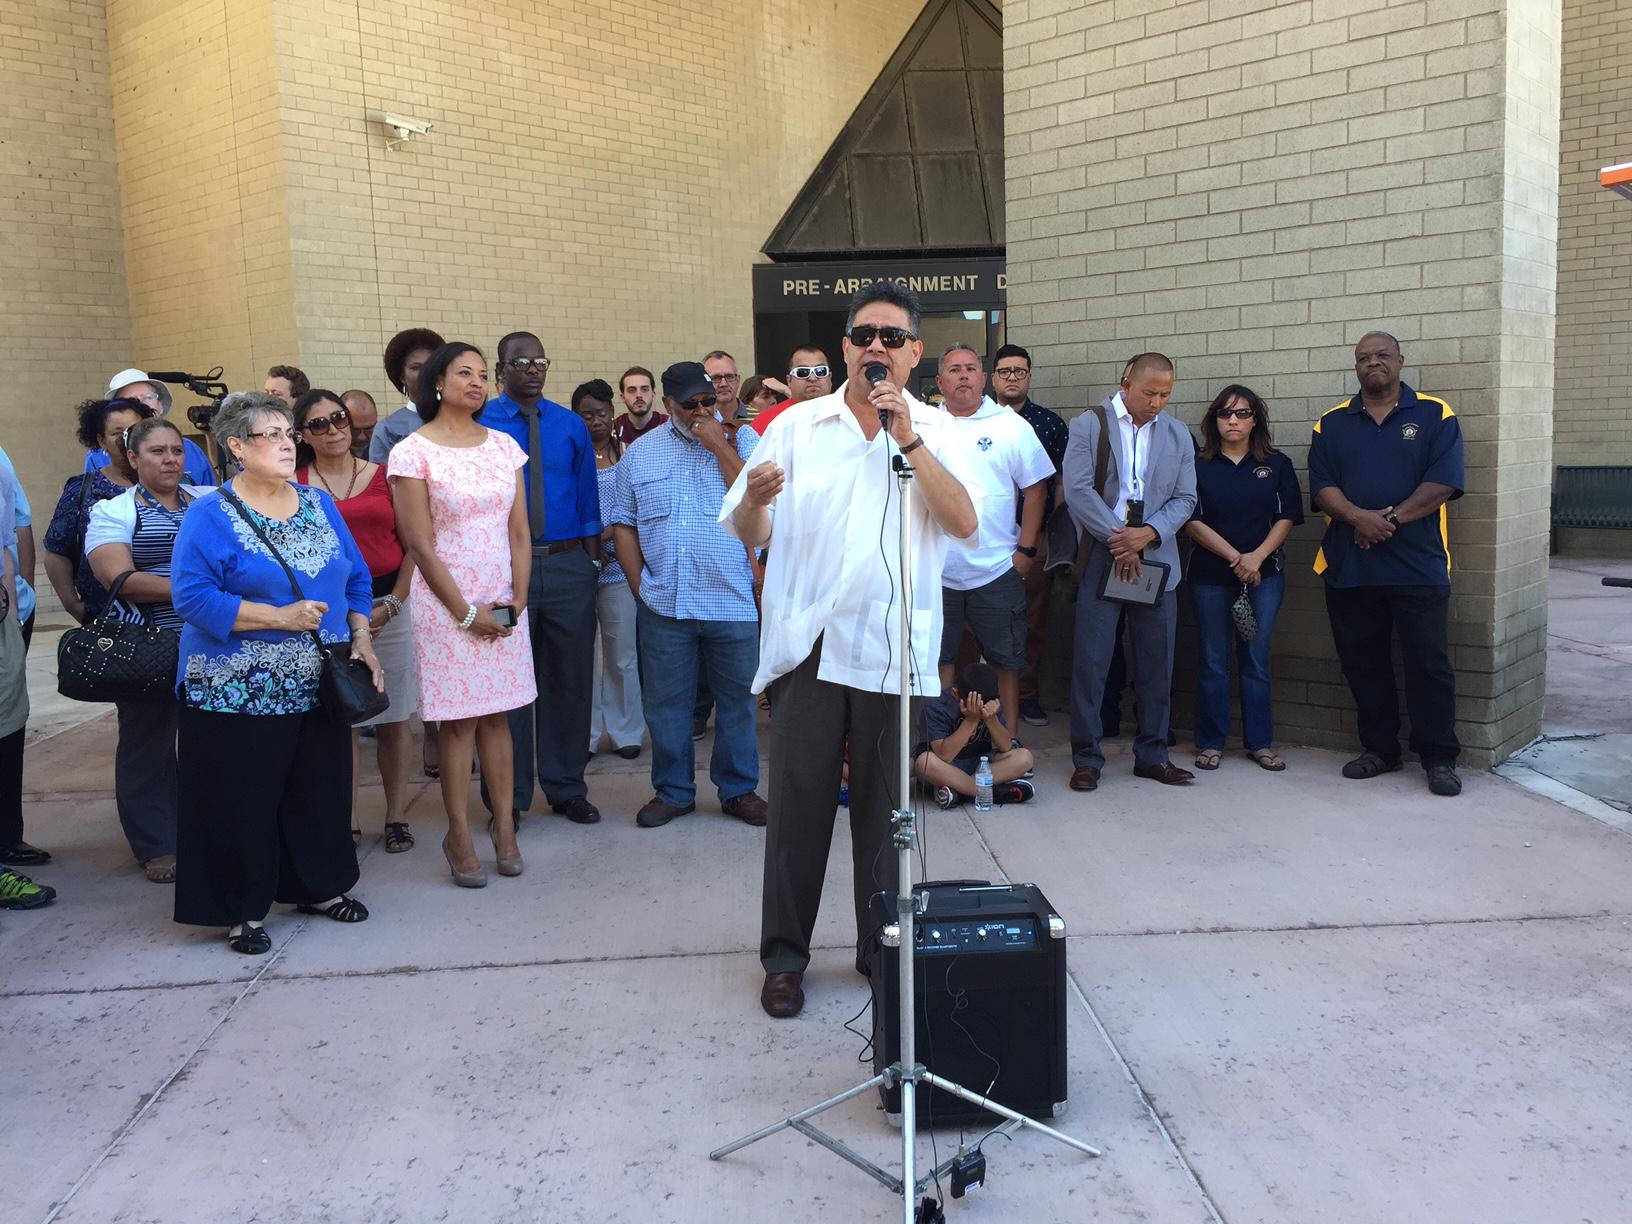 Rudy Gonzales Denver Civil Rights Jail reform